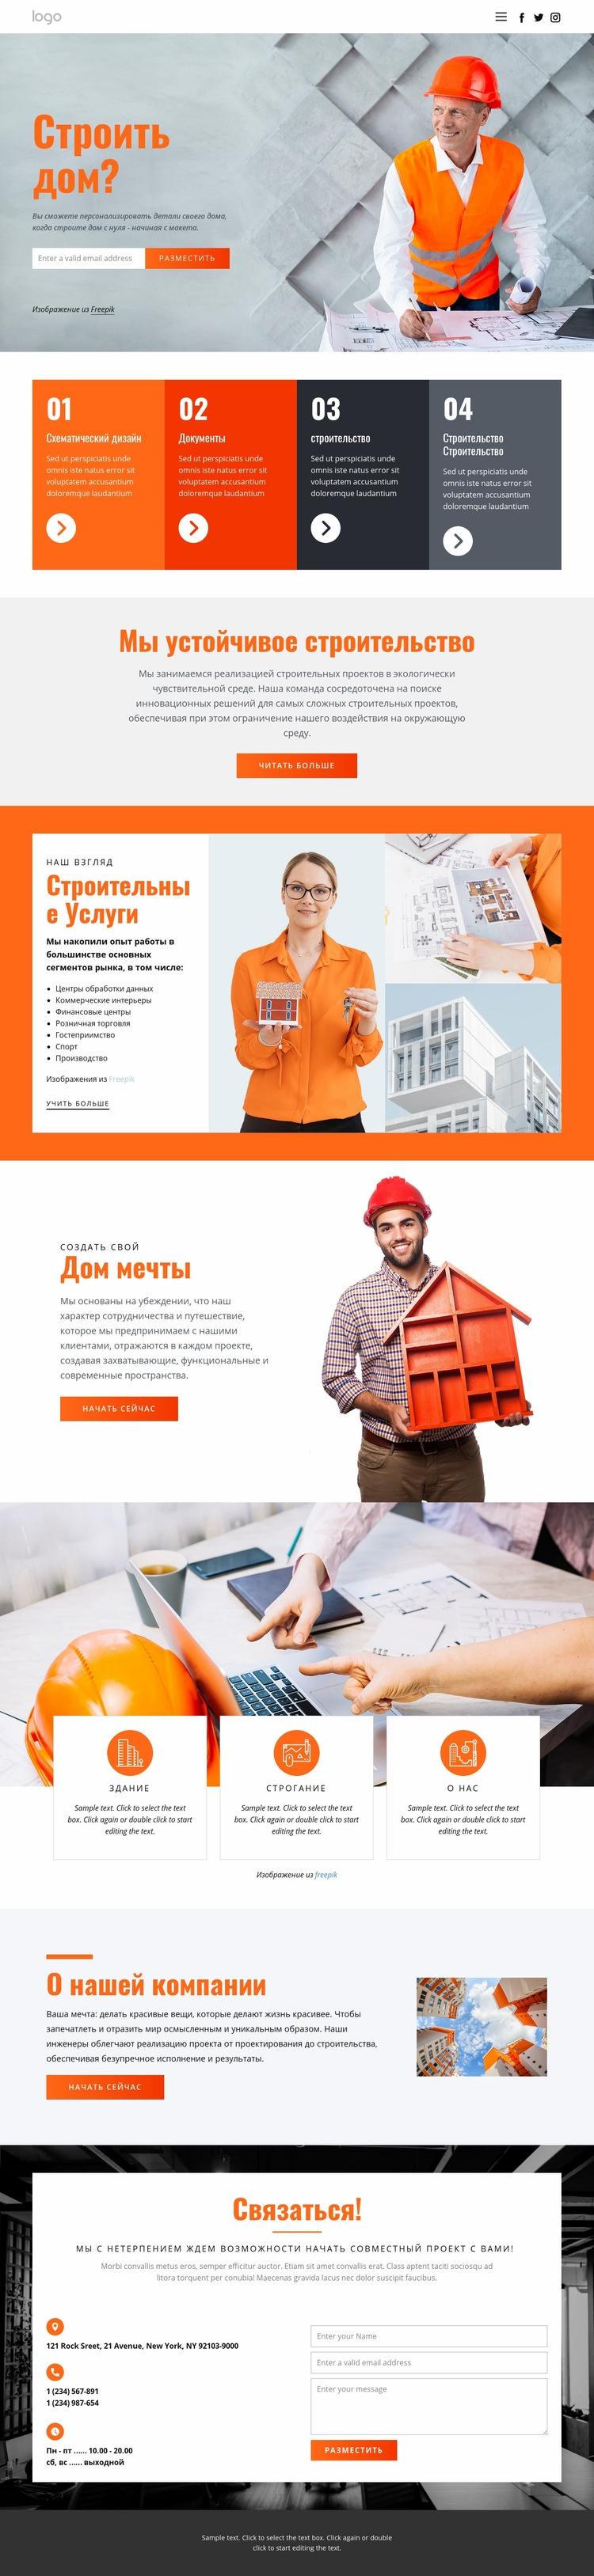 Инновационная архитектура дома Шаблон веб-сайта